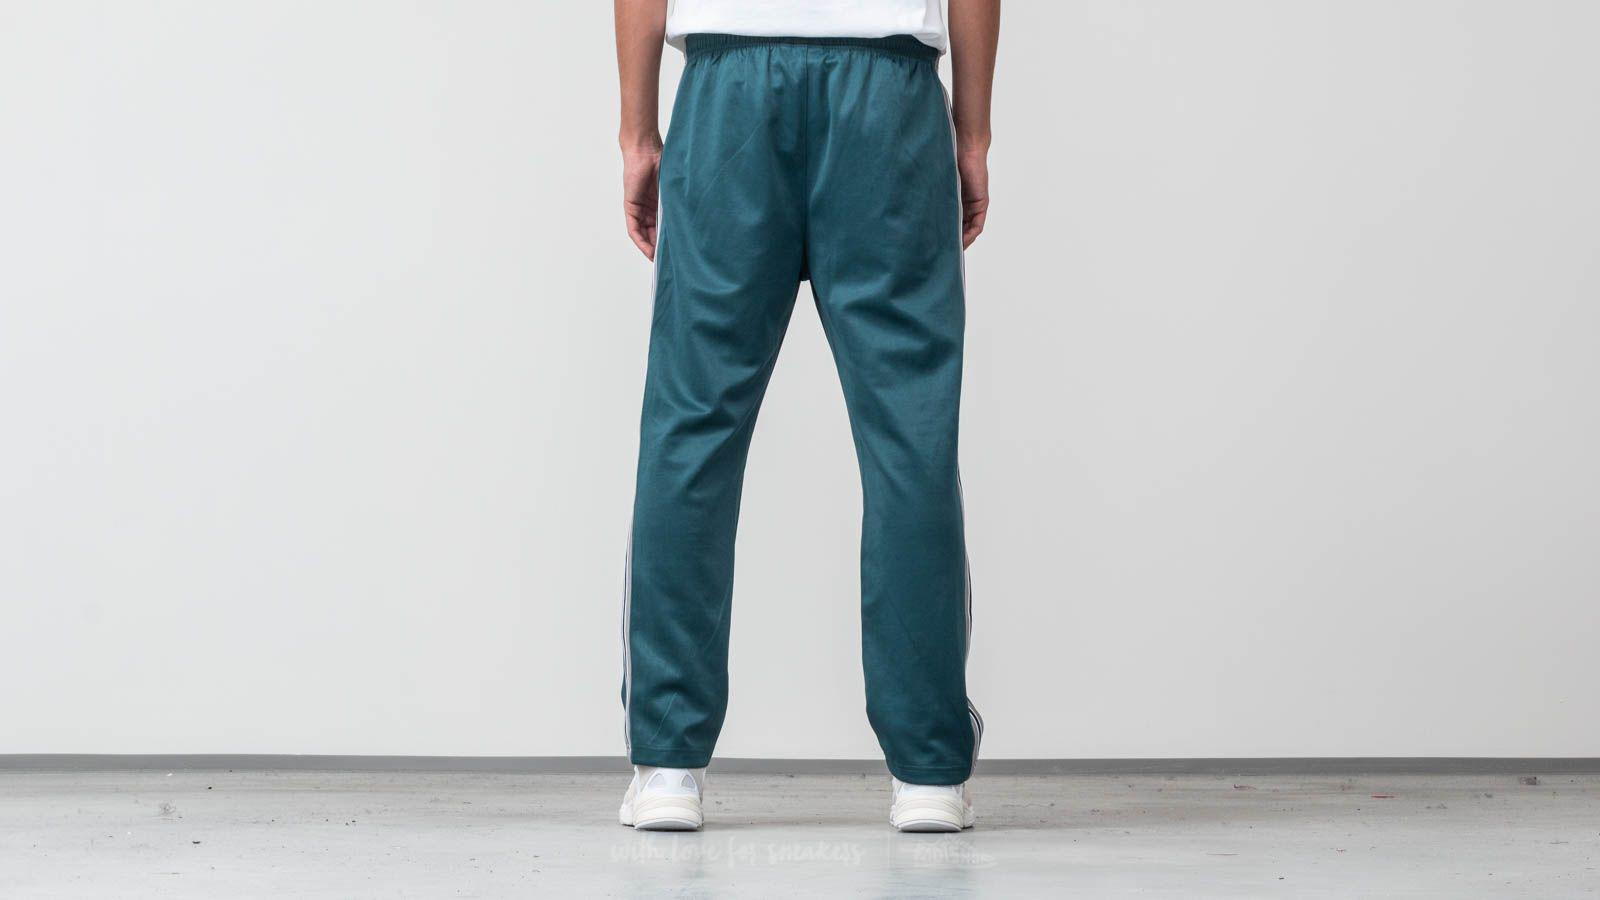 Lyst Rib Dark Stussy Textured Teal Track Blue Pant In Men For EqCEBrw 502510c1b1